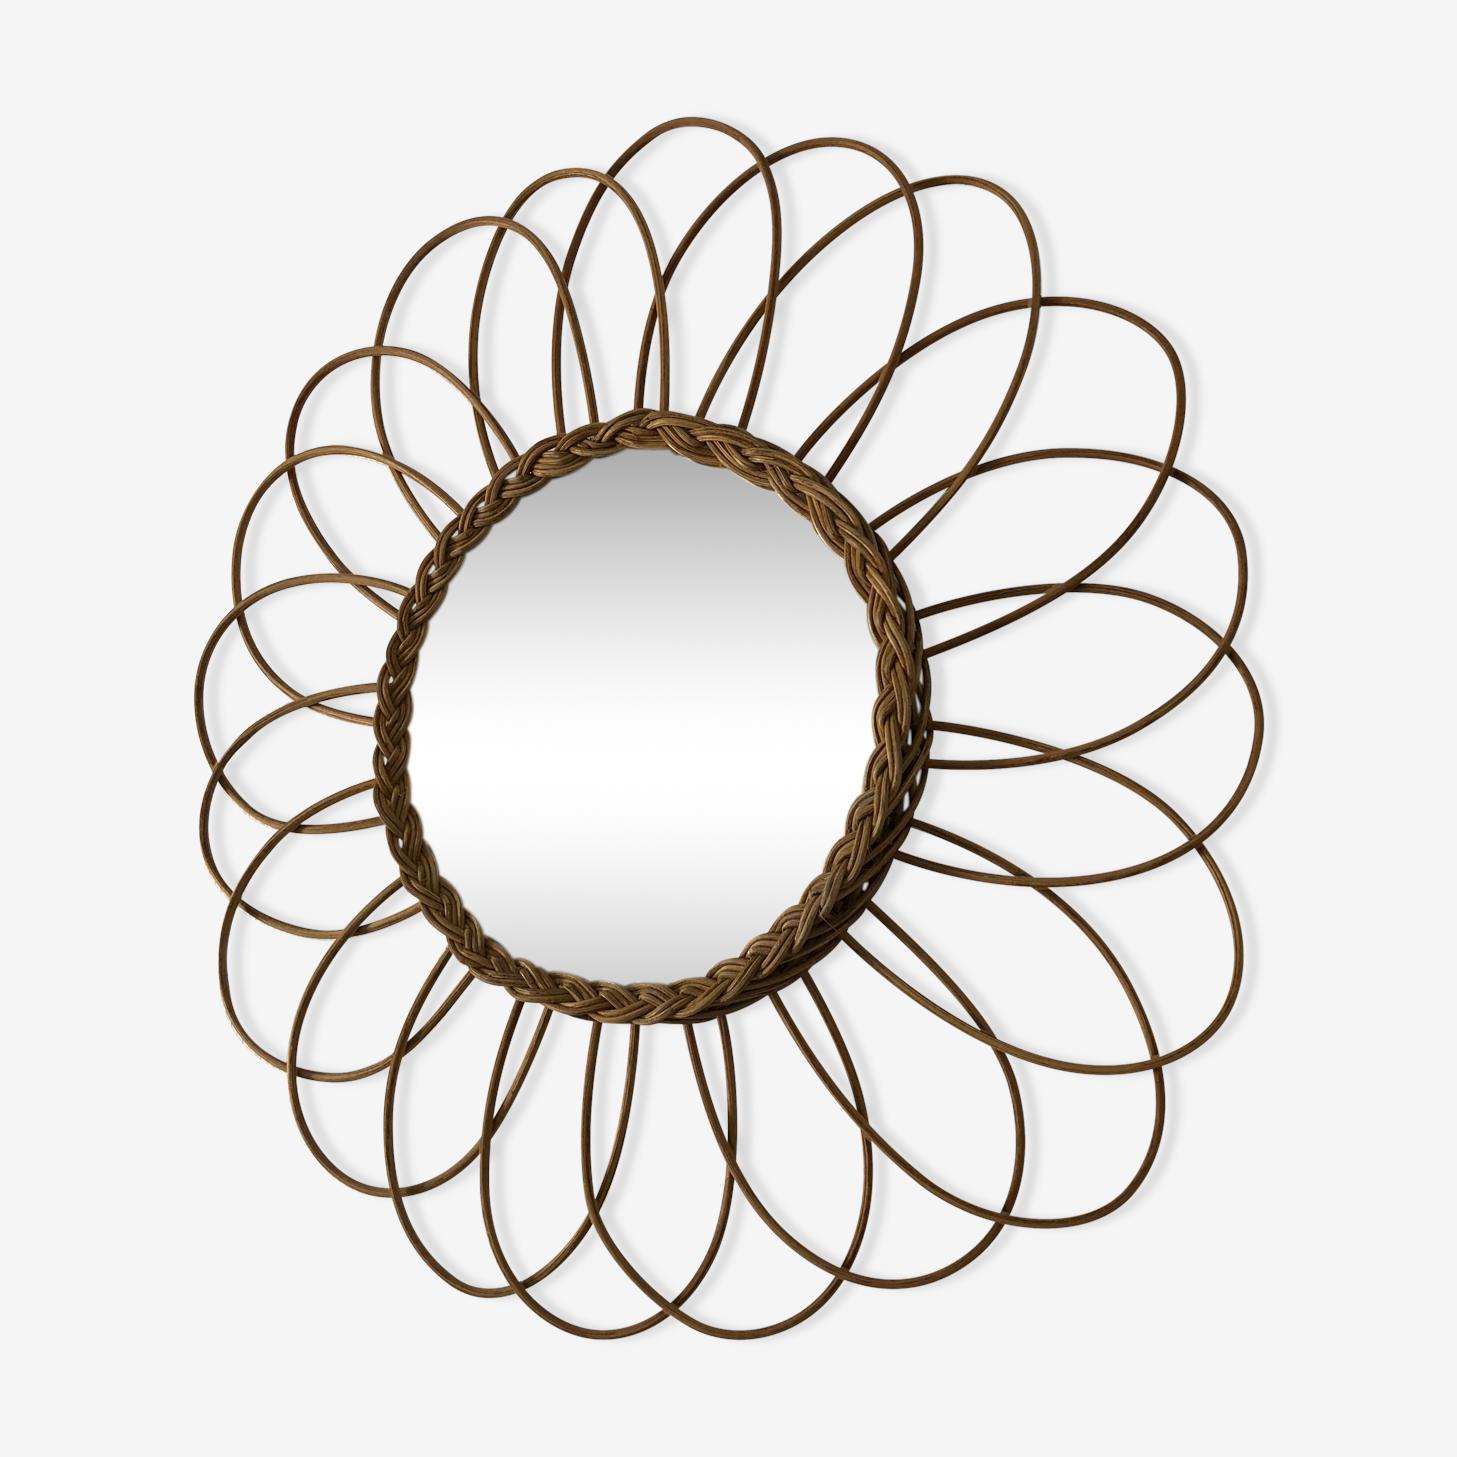 Miroir soleil fleur rotin 42x42cm vintage 1960